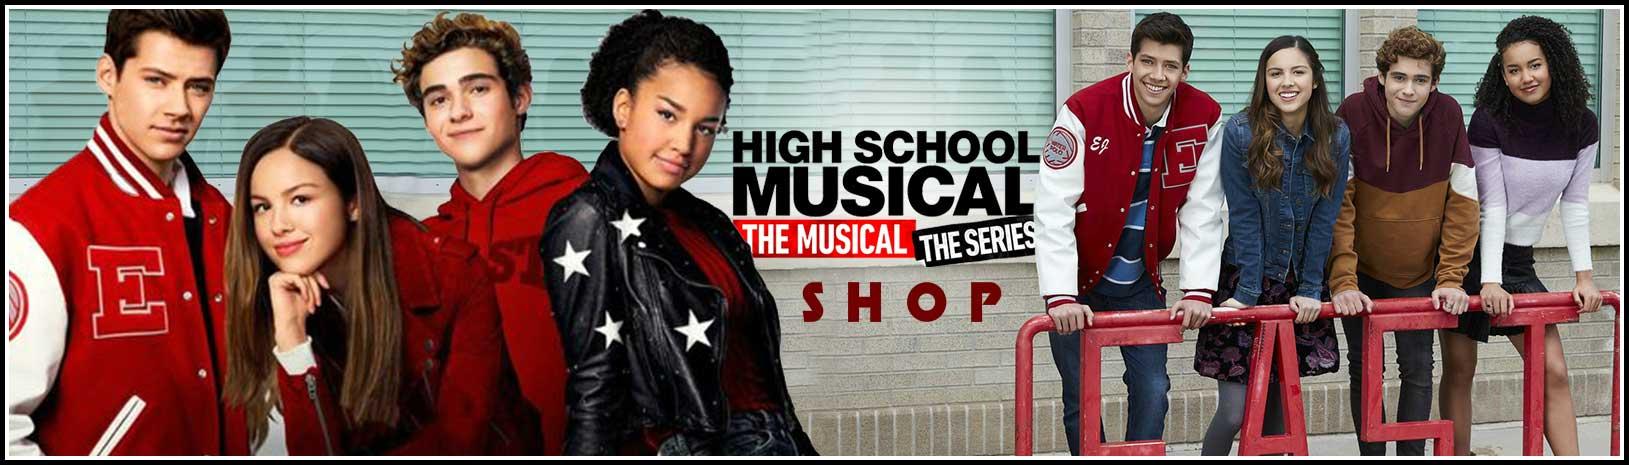 High School Musical Shop